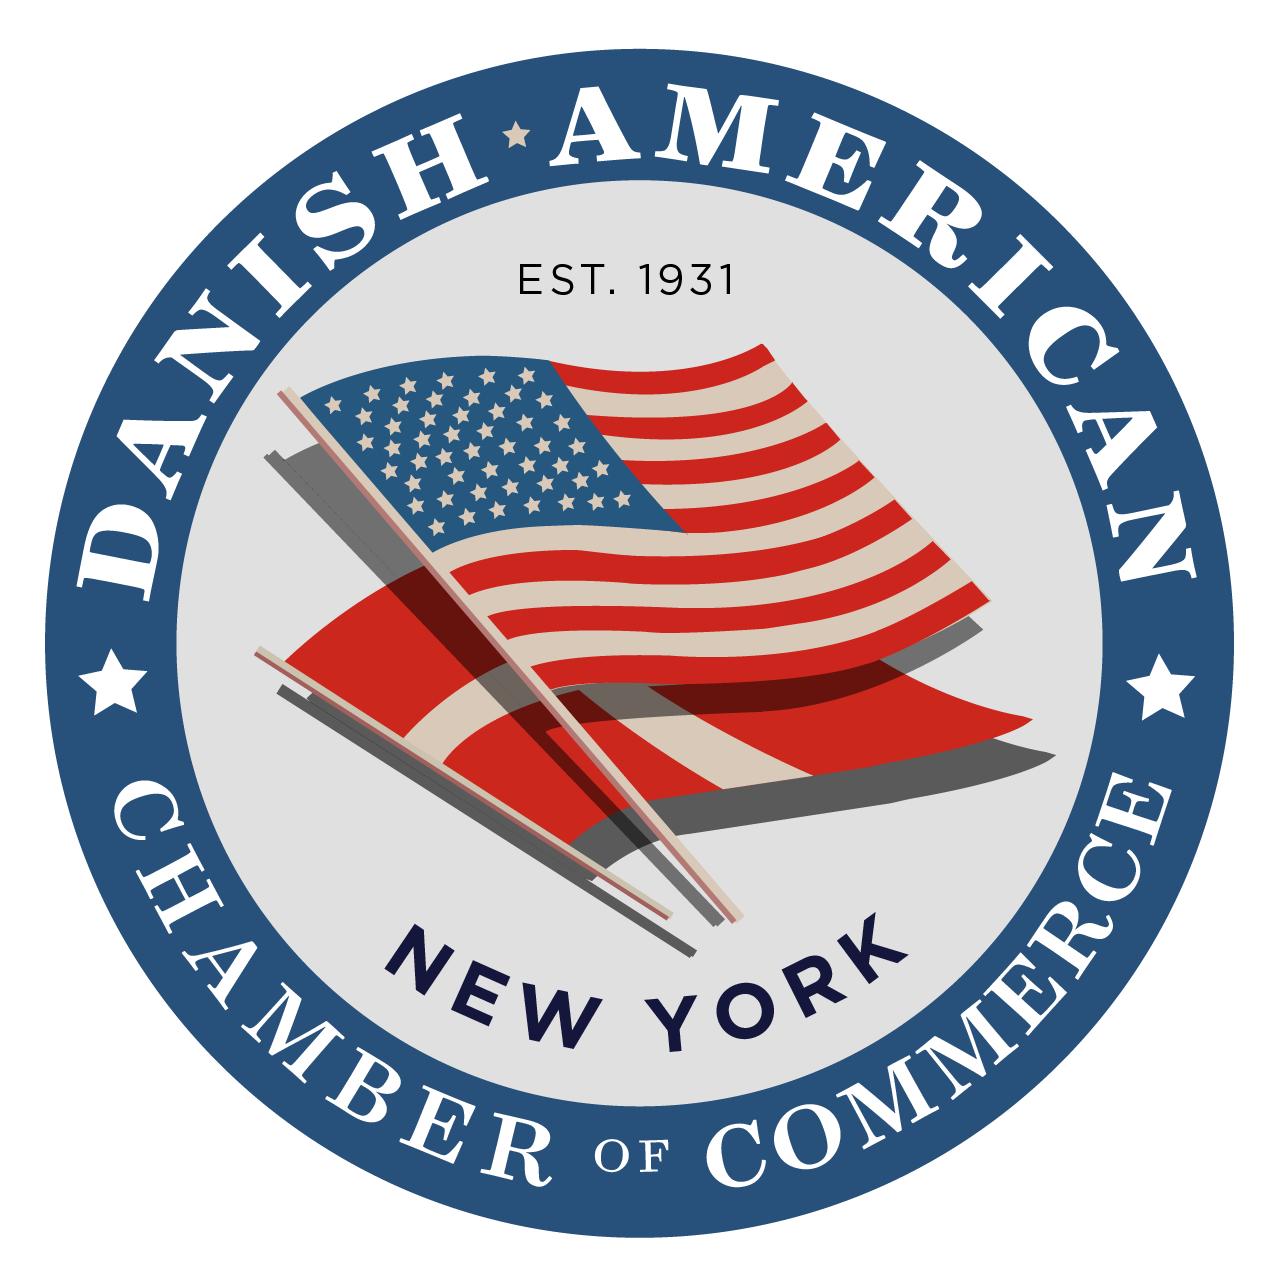 The Danish American Chamber of Commerce   One Dag Hammarskjöld Plaza    885 Second Avenue, 18th Floor, New York, NY 10017